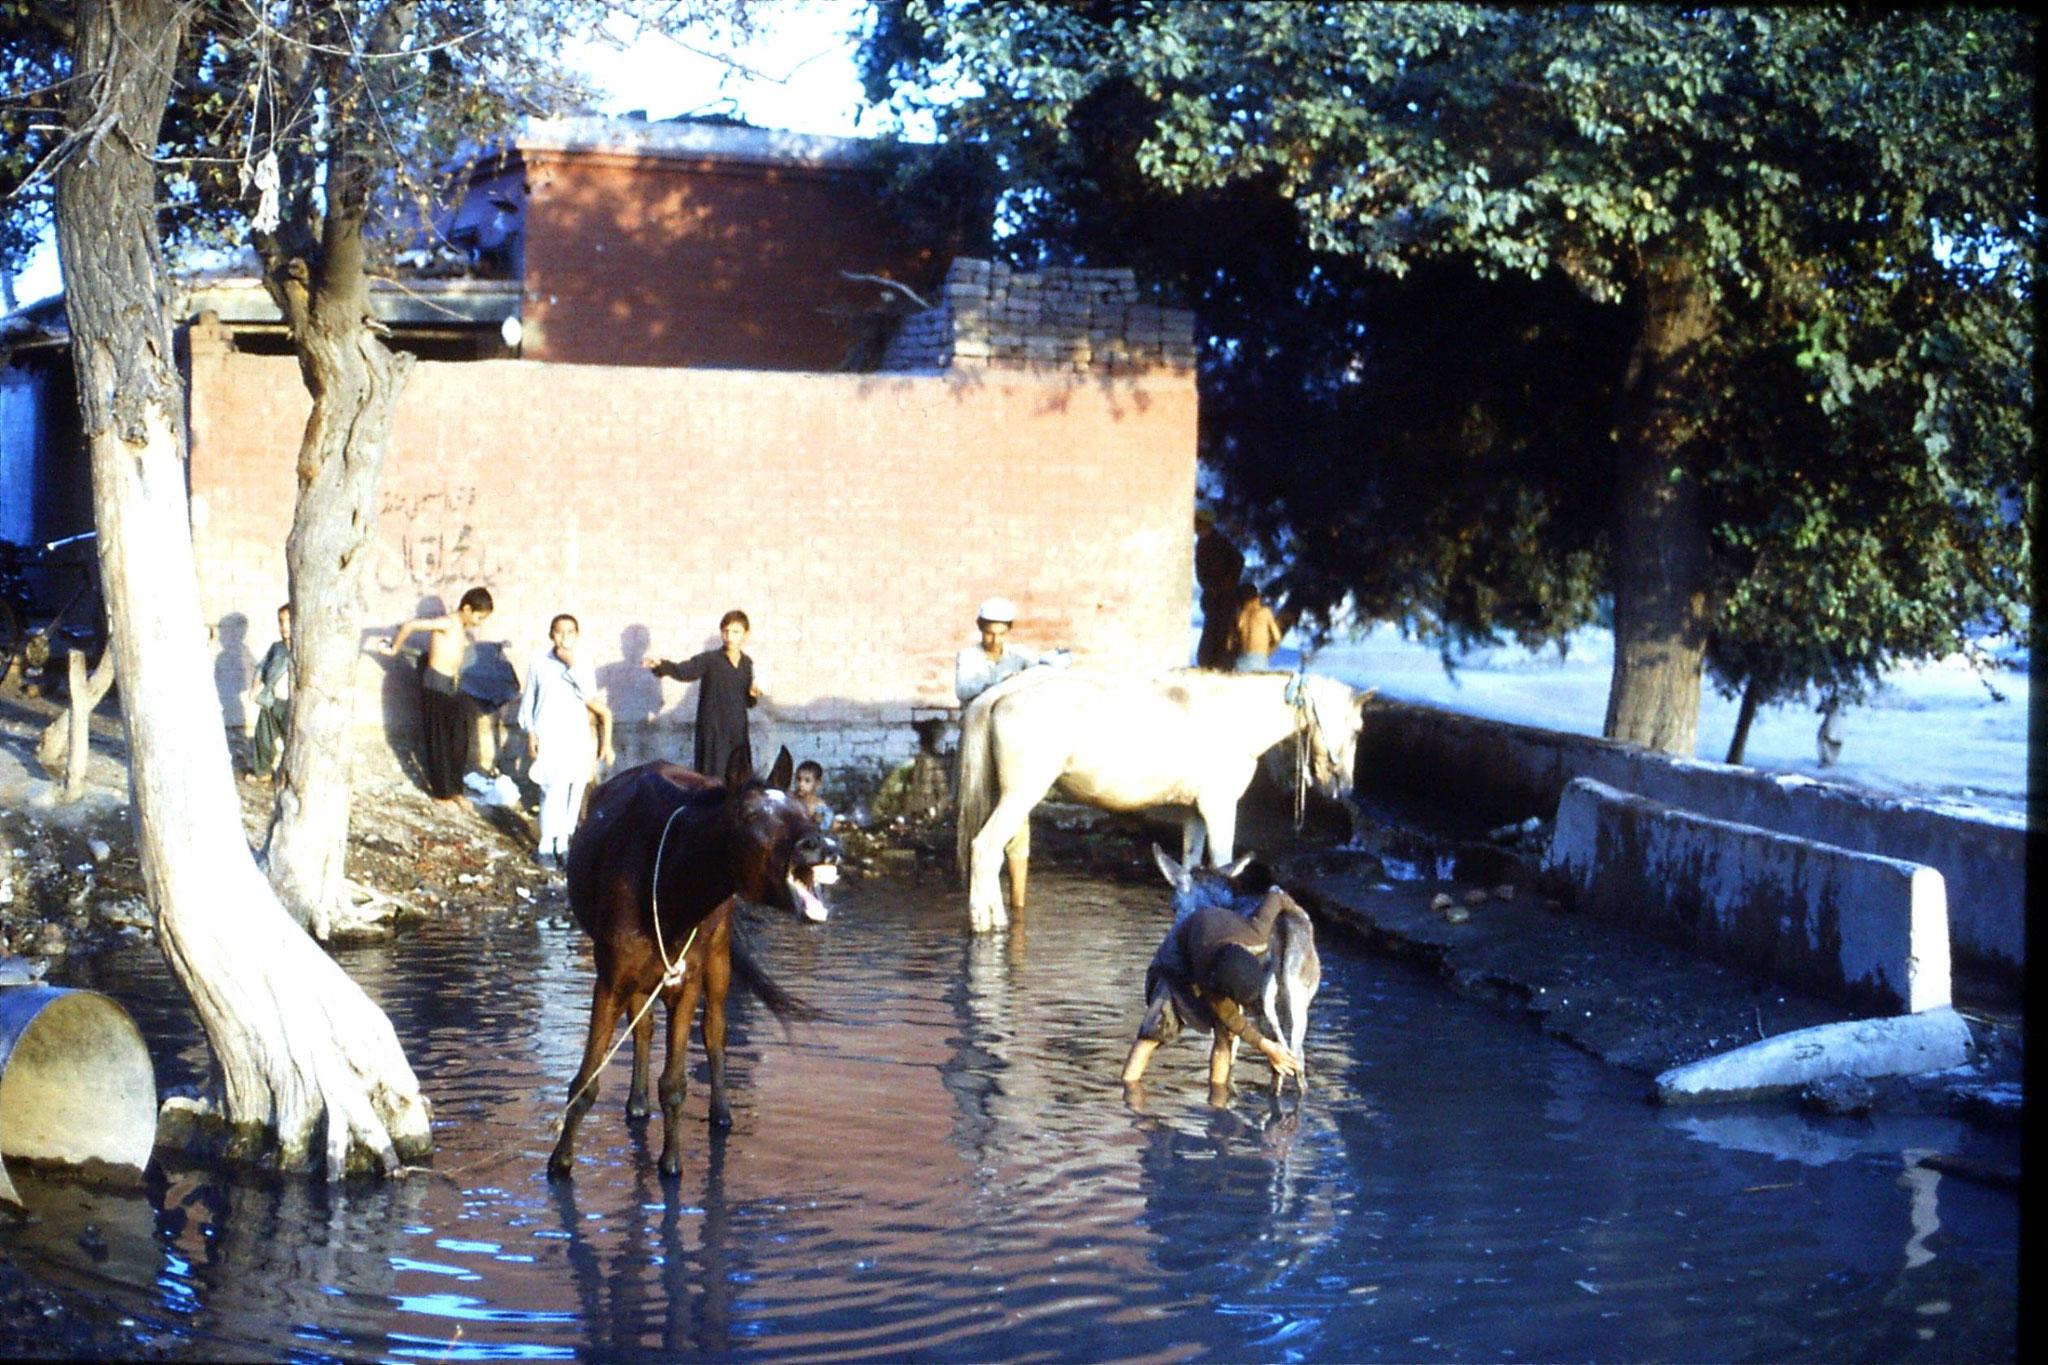 3/11/1989: 8: Peshawar, Wazir Barg horse bath